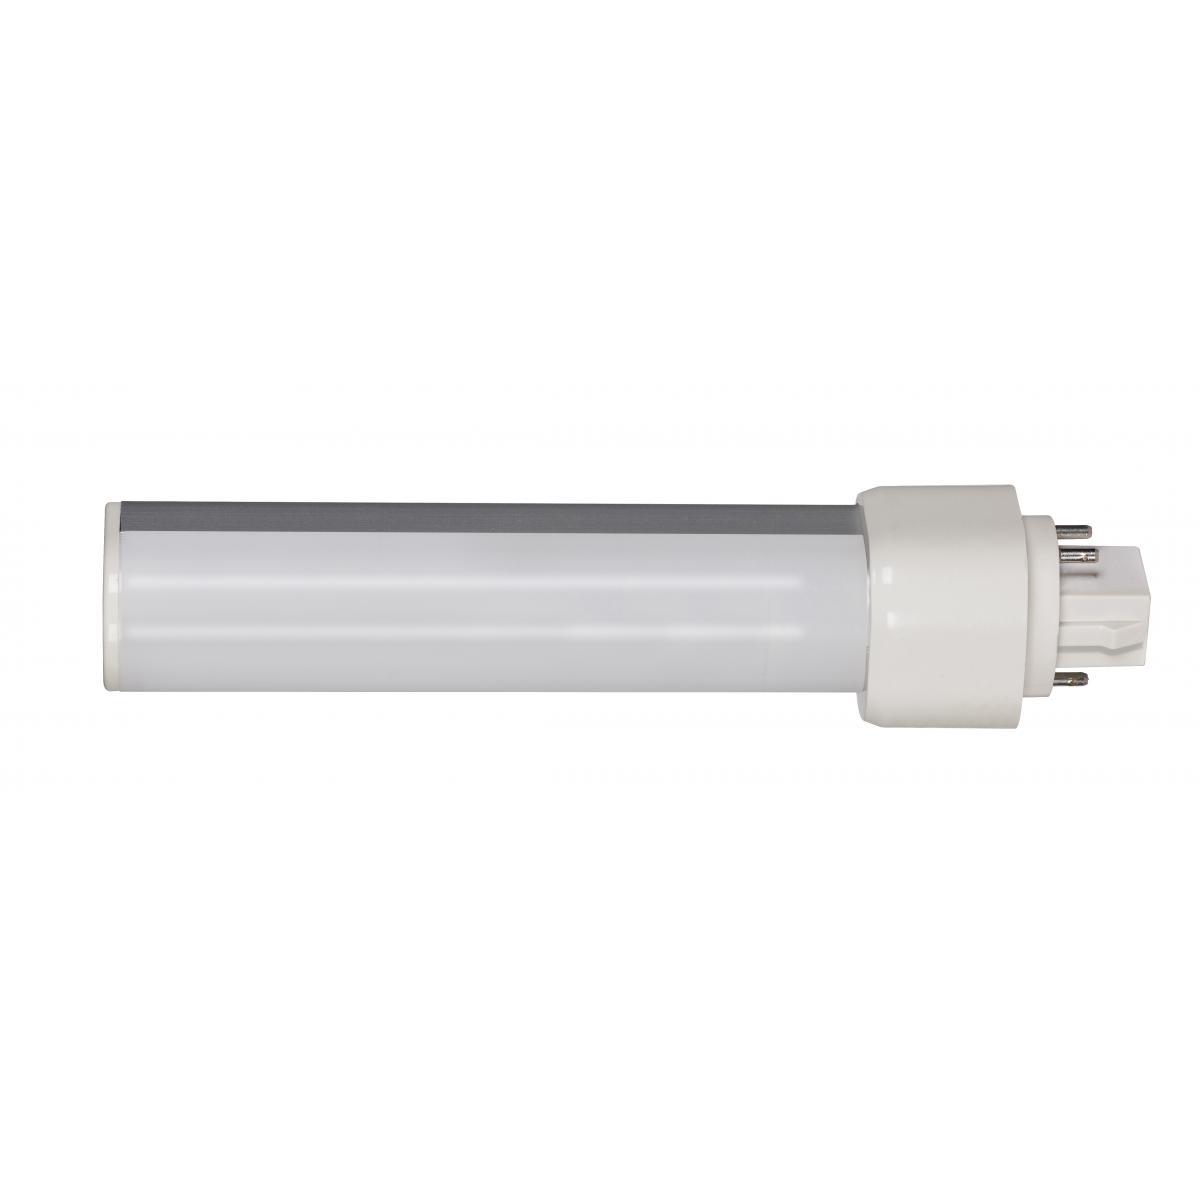 S29851 9WPLH/LED/835/DR/4P